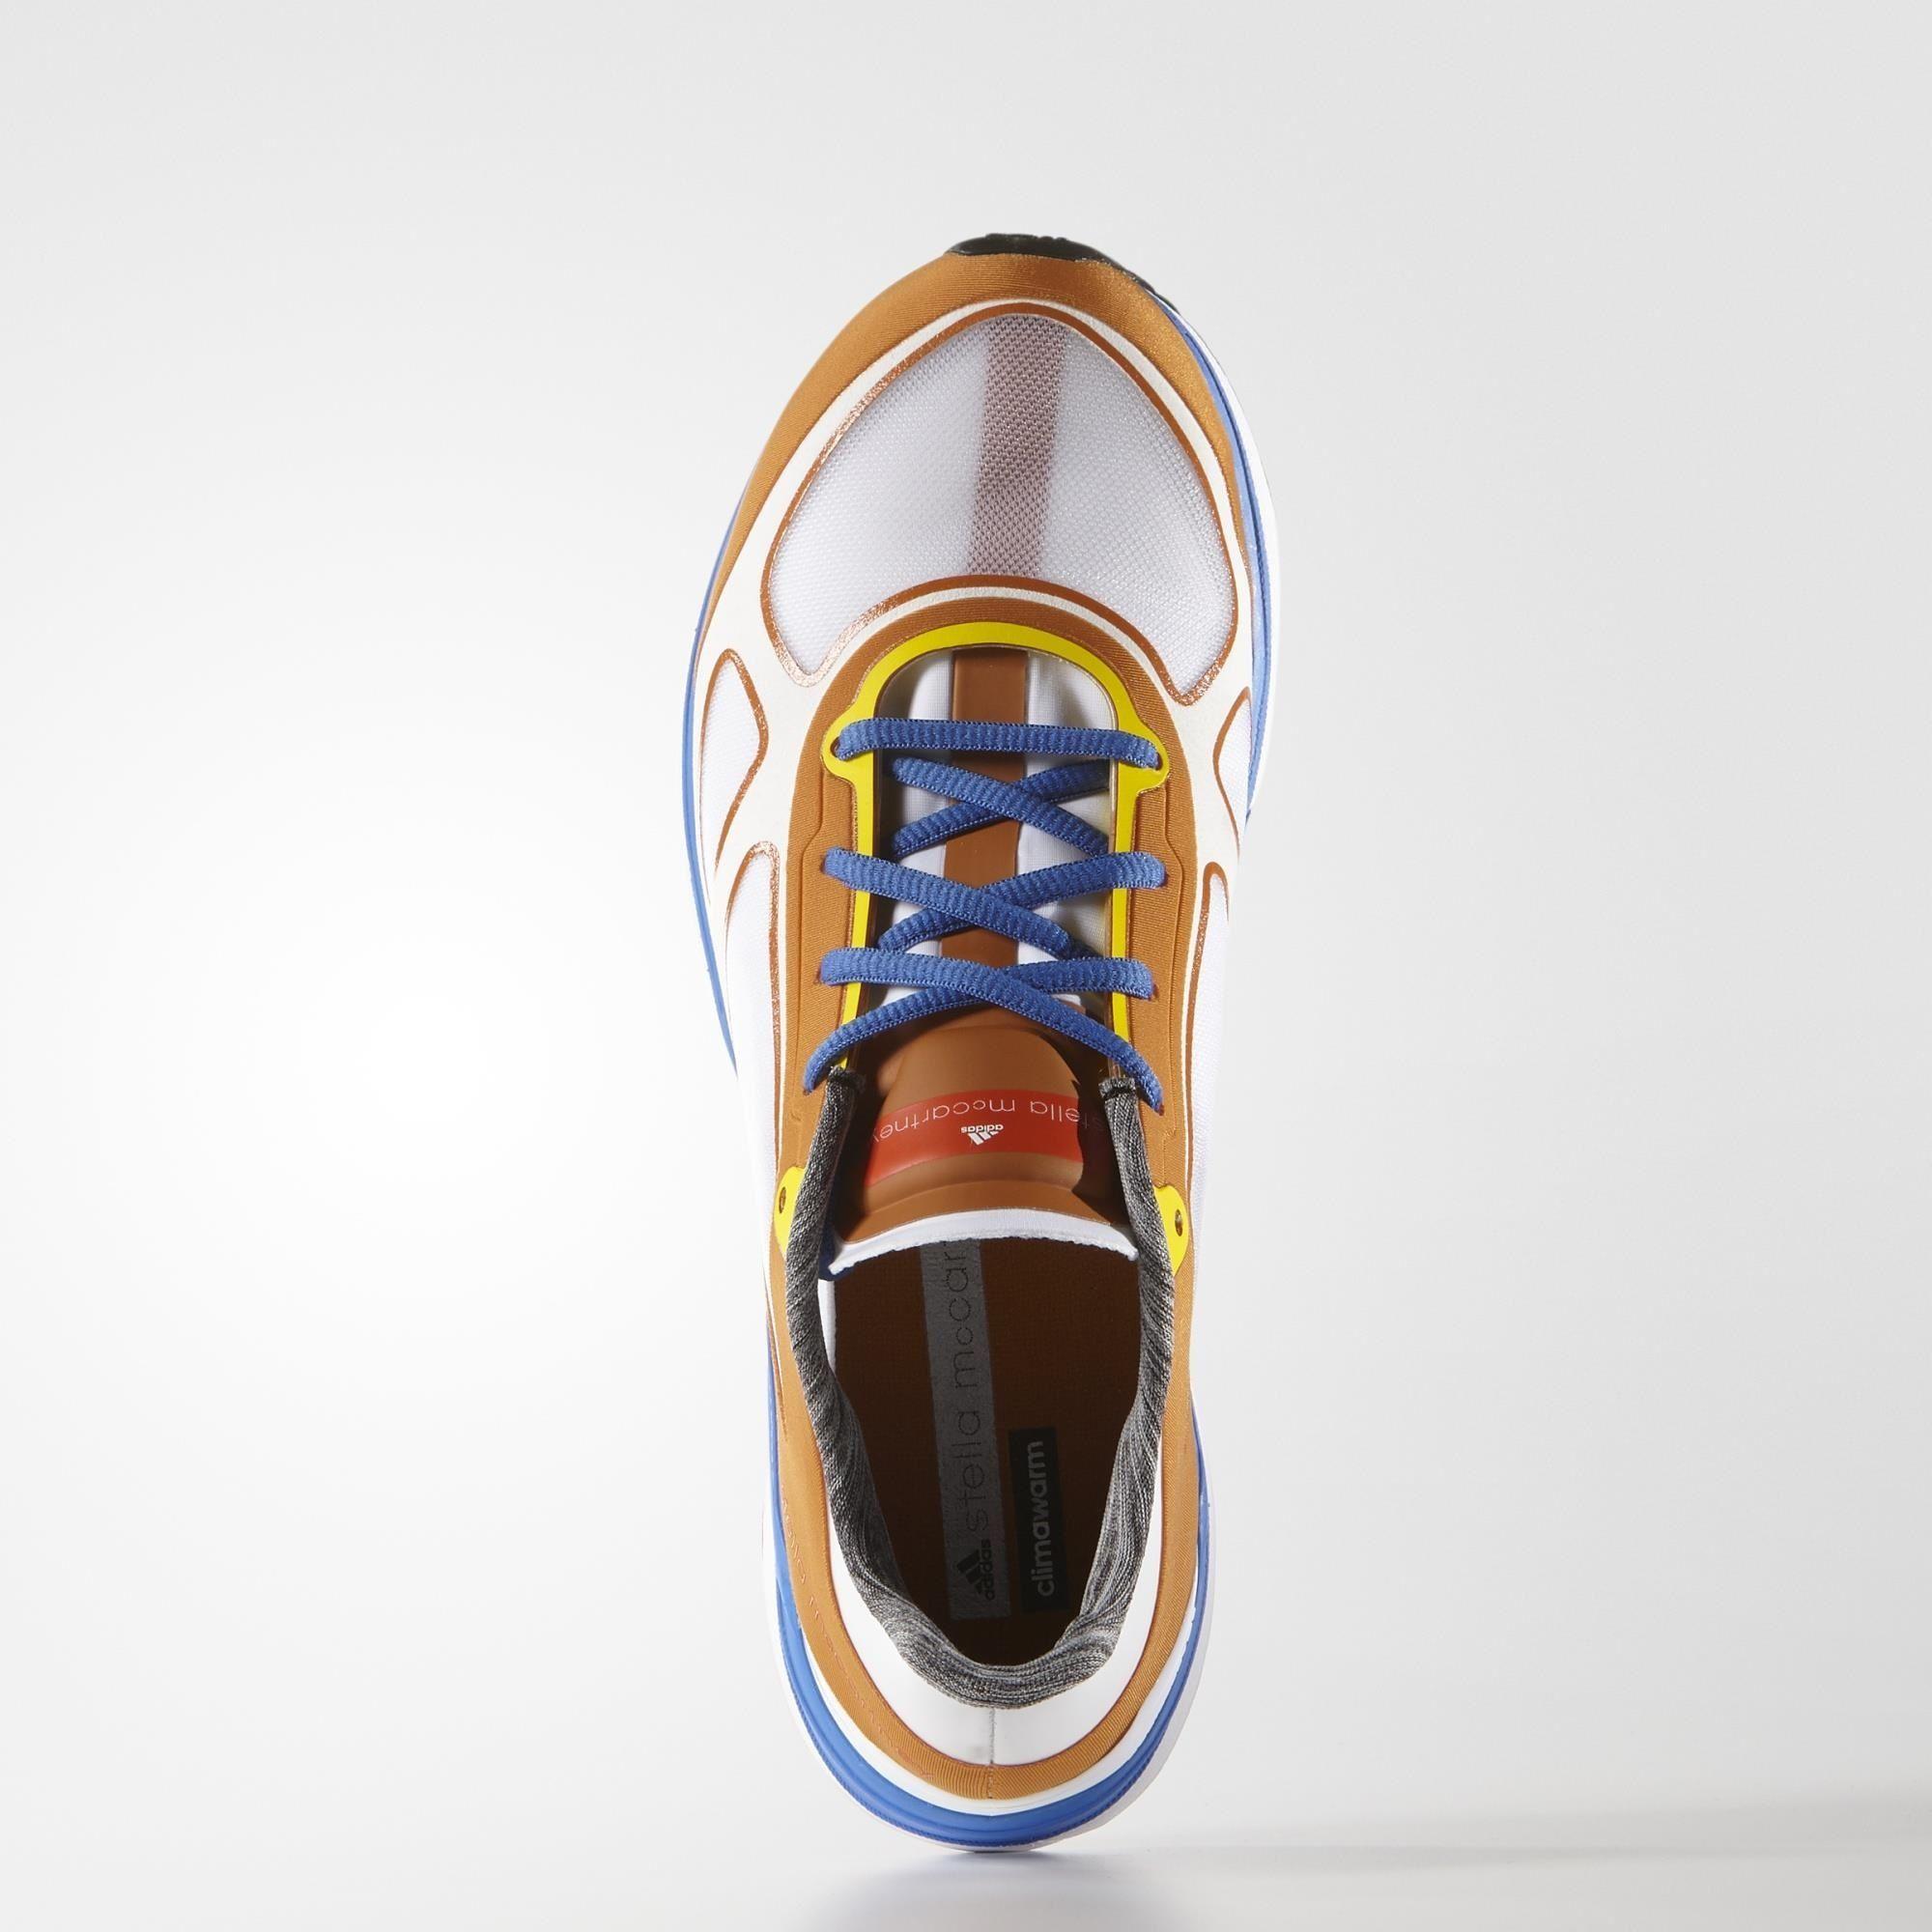 Chaussure Dorifera Feather Warm Spice Smc adidas adidas France